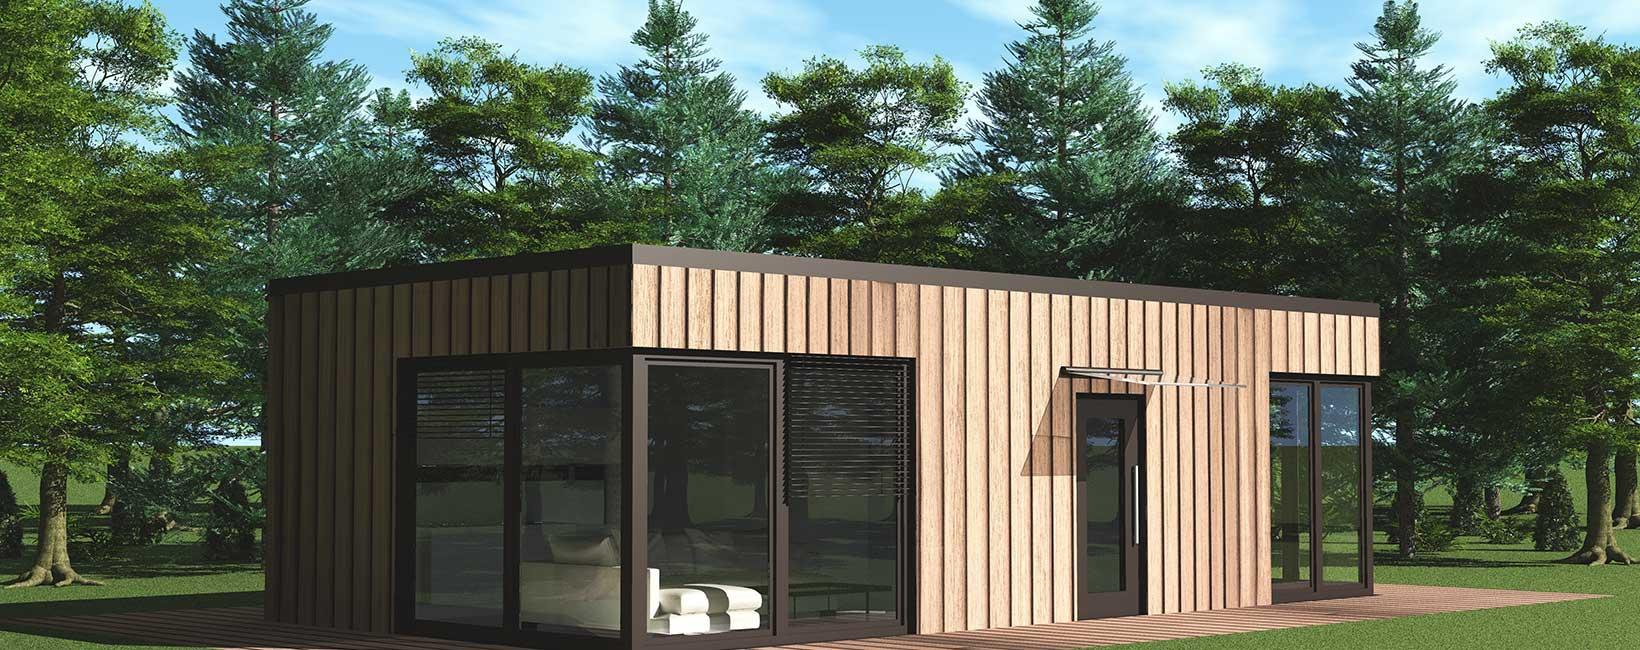 tiny house das gro e gl ck im mini haus. Black Bedroom Furniture Sets. Home Design Ideas